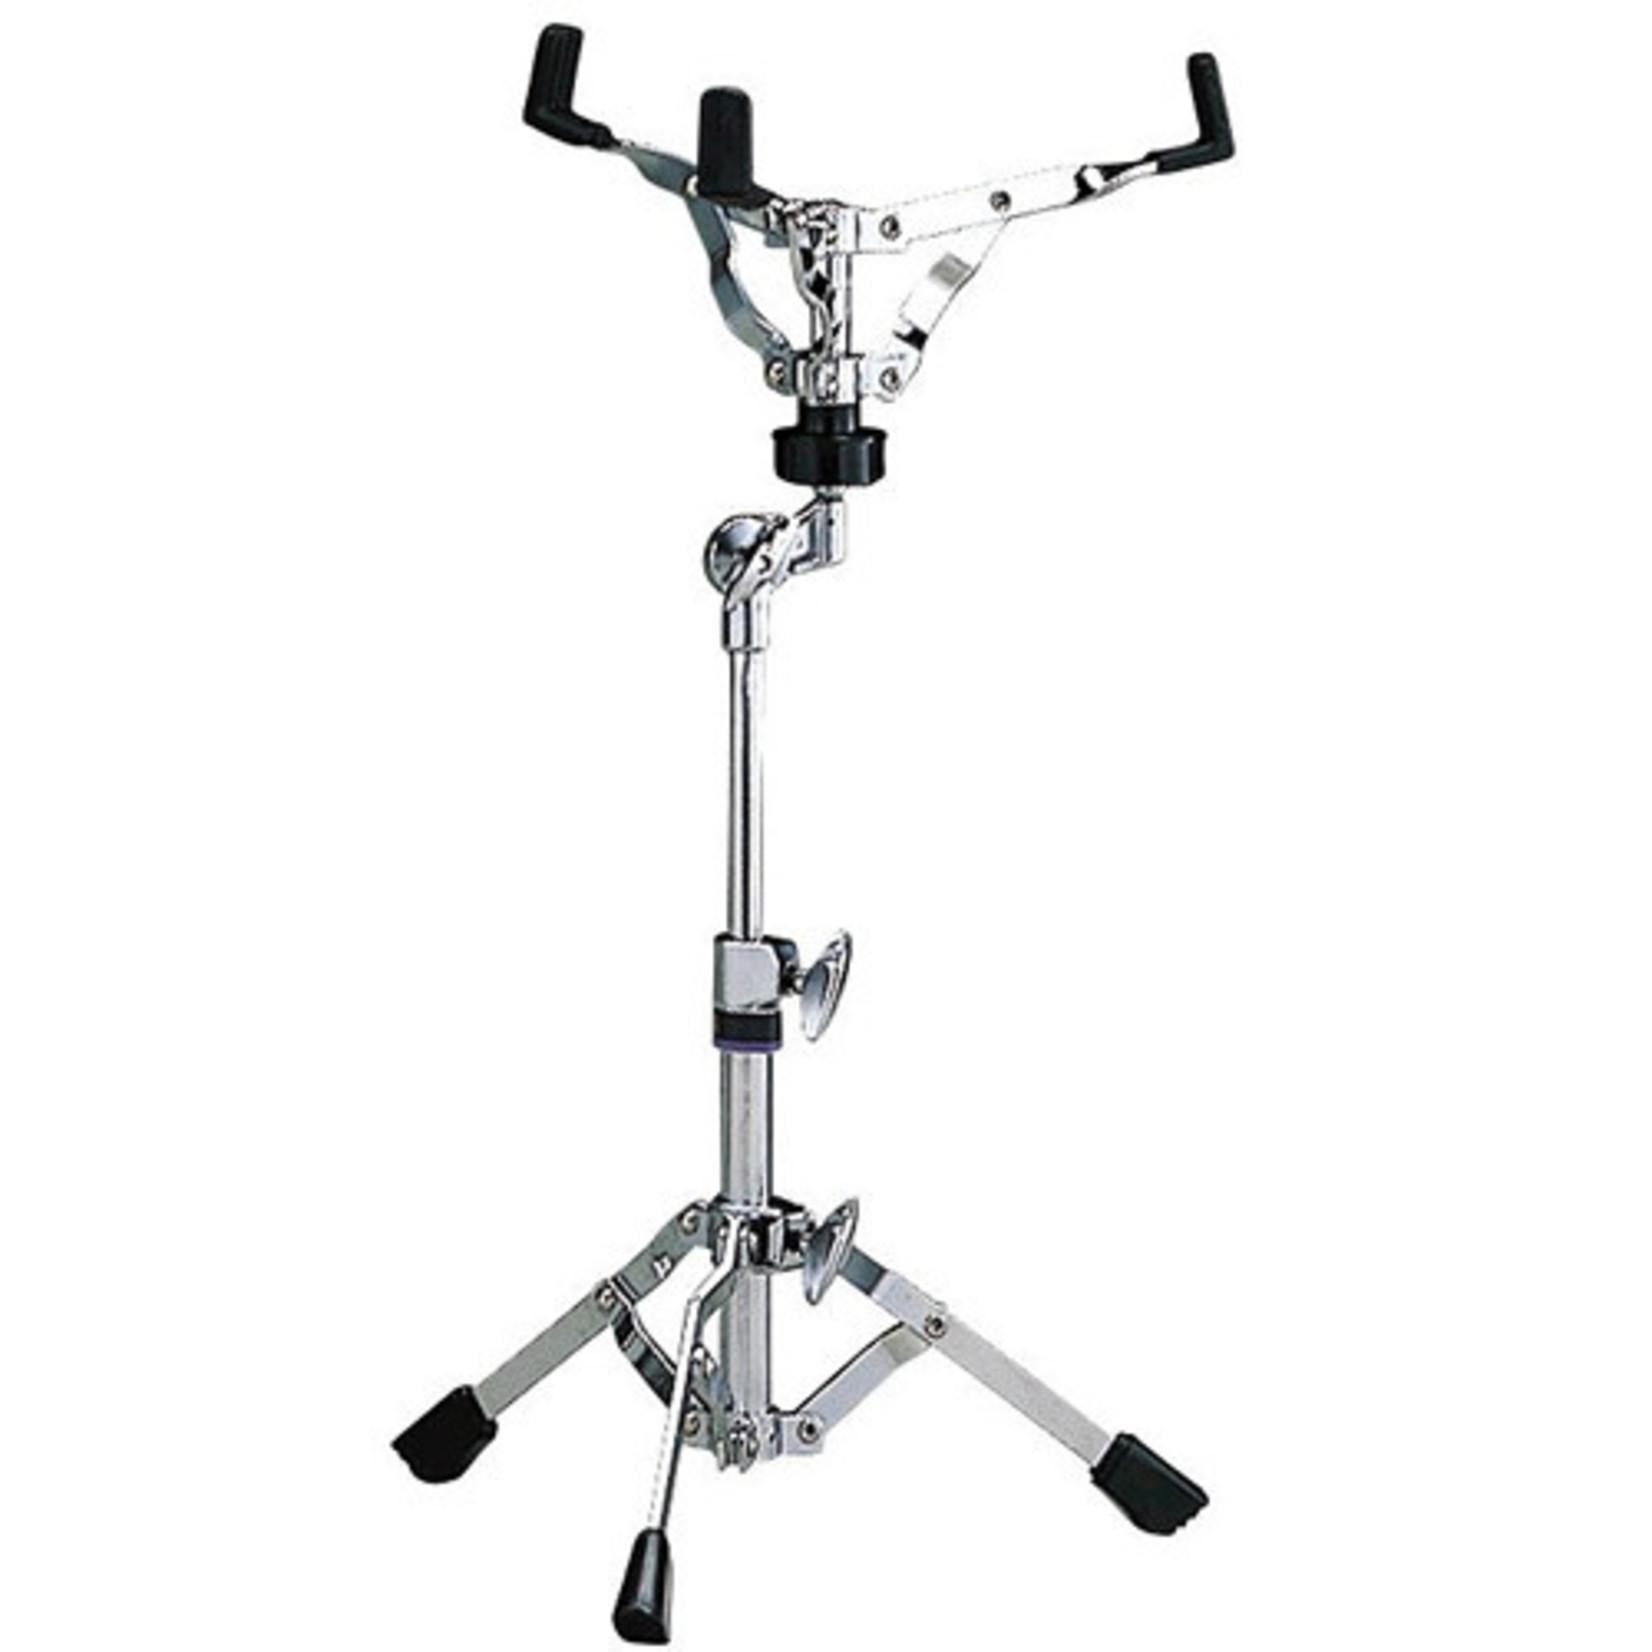 Yamaha Yamaha Snare Drum Stand - Light Weight - Single Braced